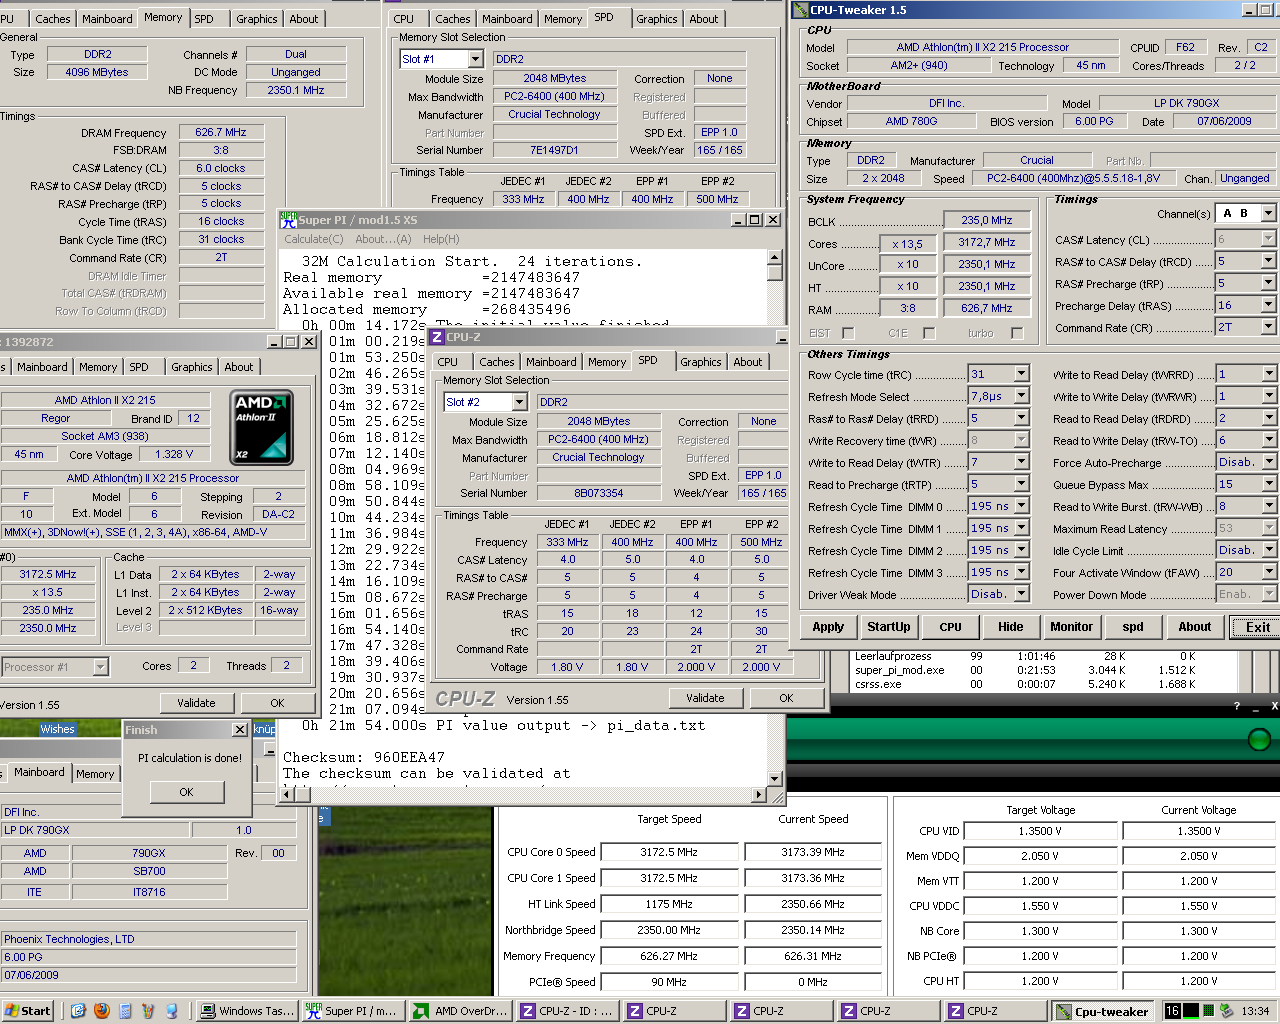 627-MHz---6-5-5-16---2.05v---2x2-GB-Crucial-Ballistix-PC2-6400-BL25664AA80A.16FE5---D9Jxx-v---790GX---Wishes----790GX-M2RS--DS-Auto--ODT-an--SS-aus---215--CPU-NB---2350---1-275V-up.png